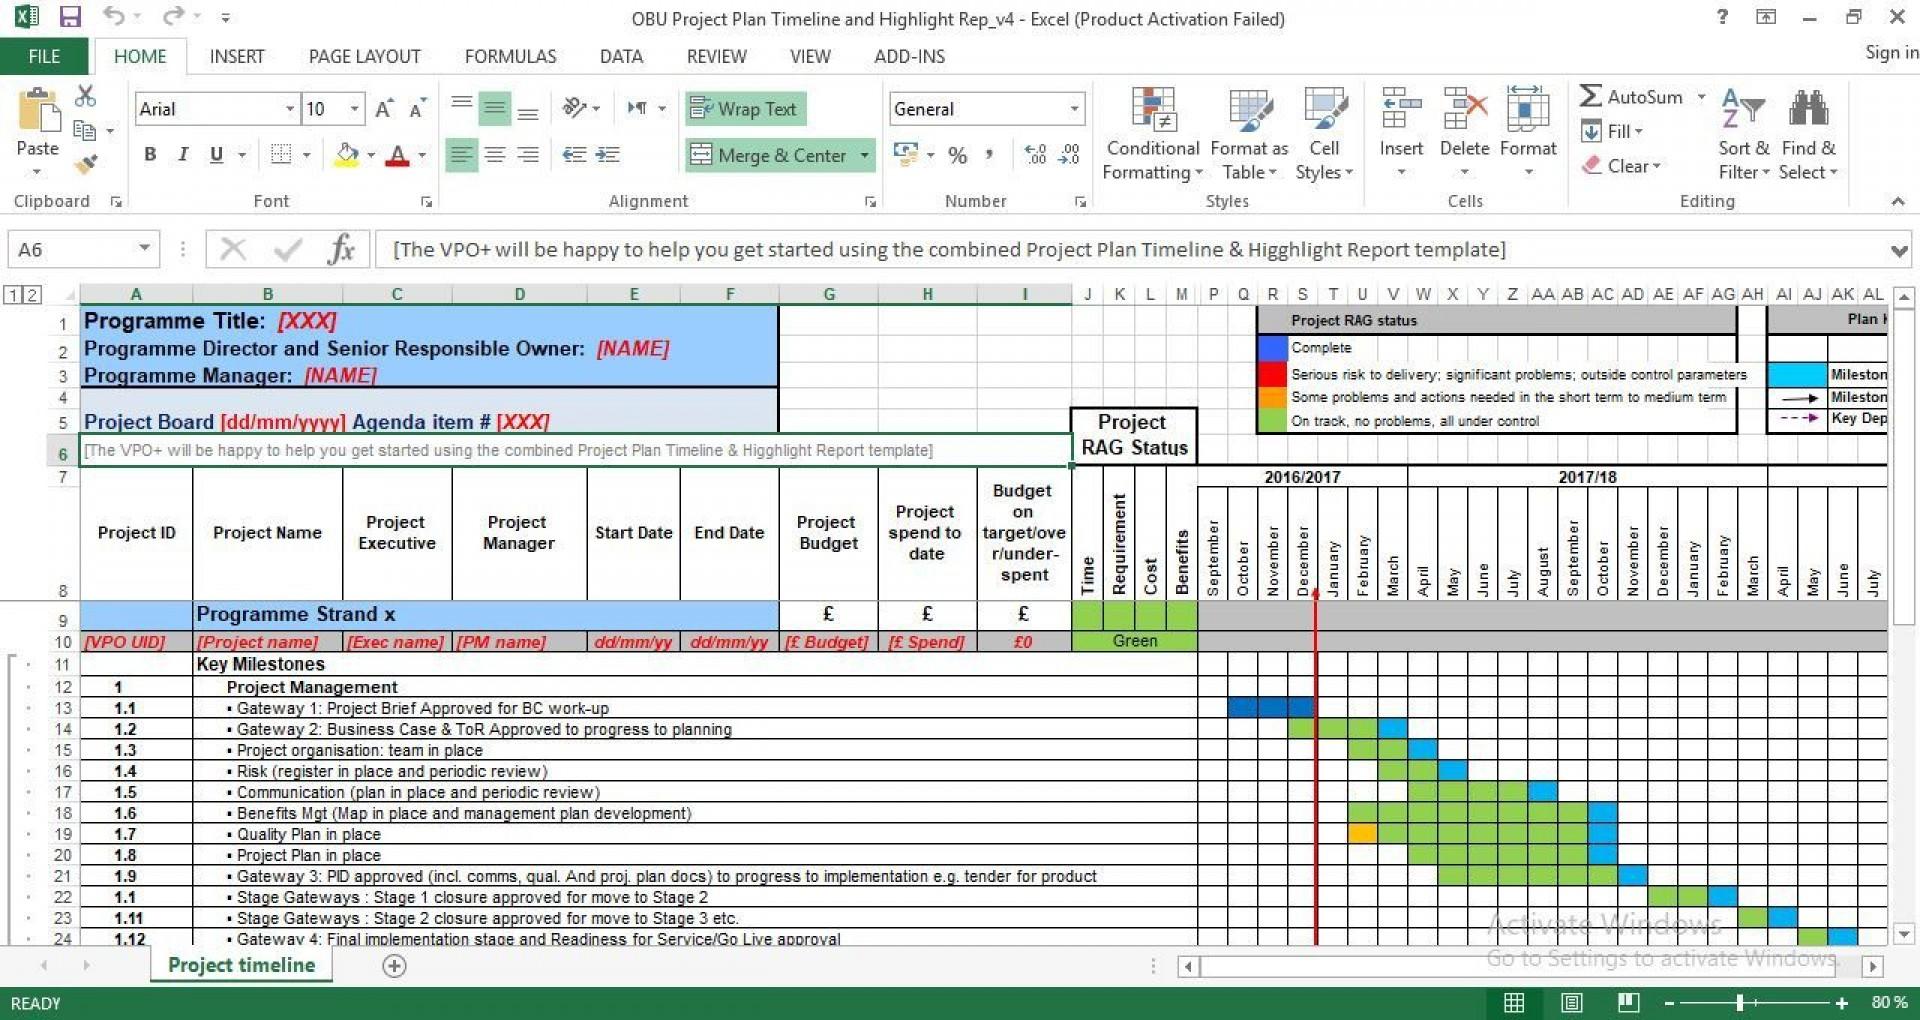 007 Breathtaking Project Management Timeline Template Photo  Plan Pmbok Planner1920